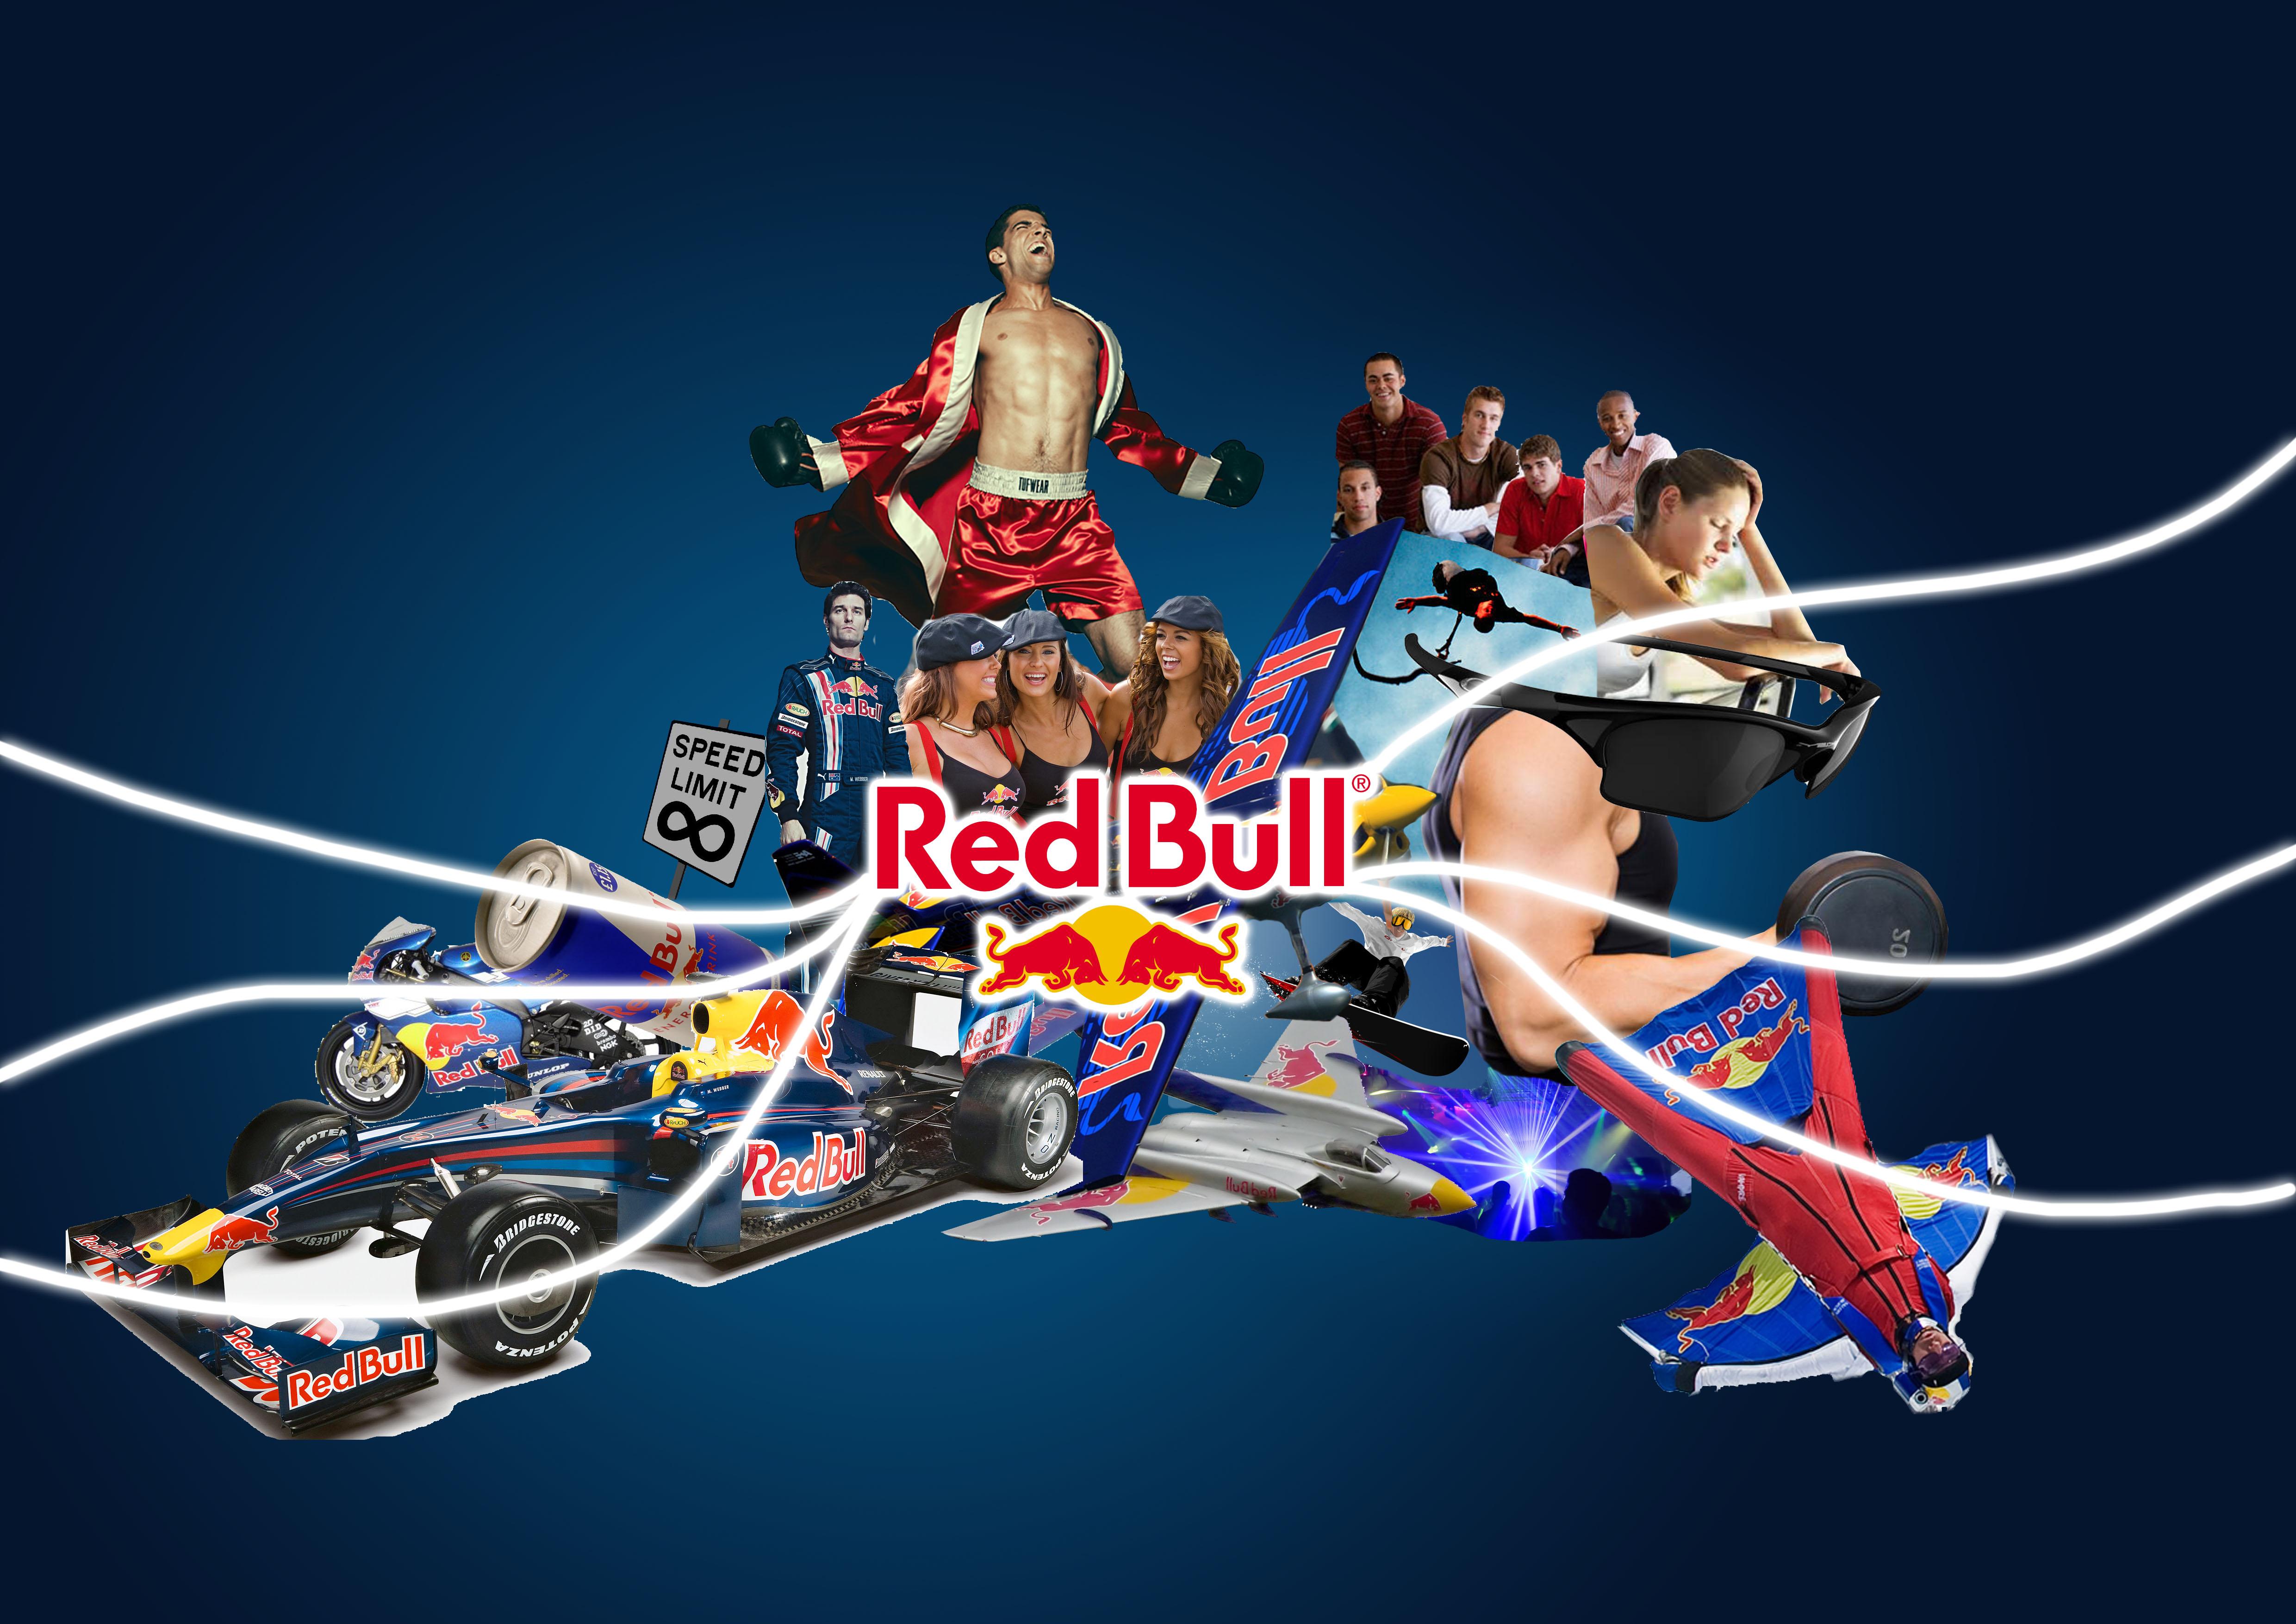 Red Bull Semantics by Richard Pearce at Coroflot.com